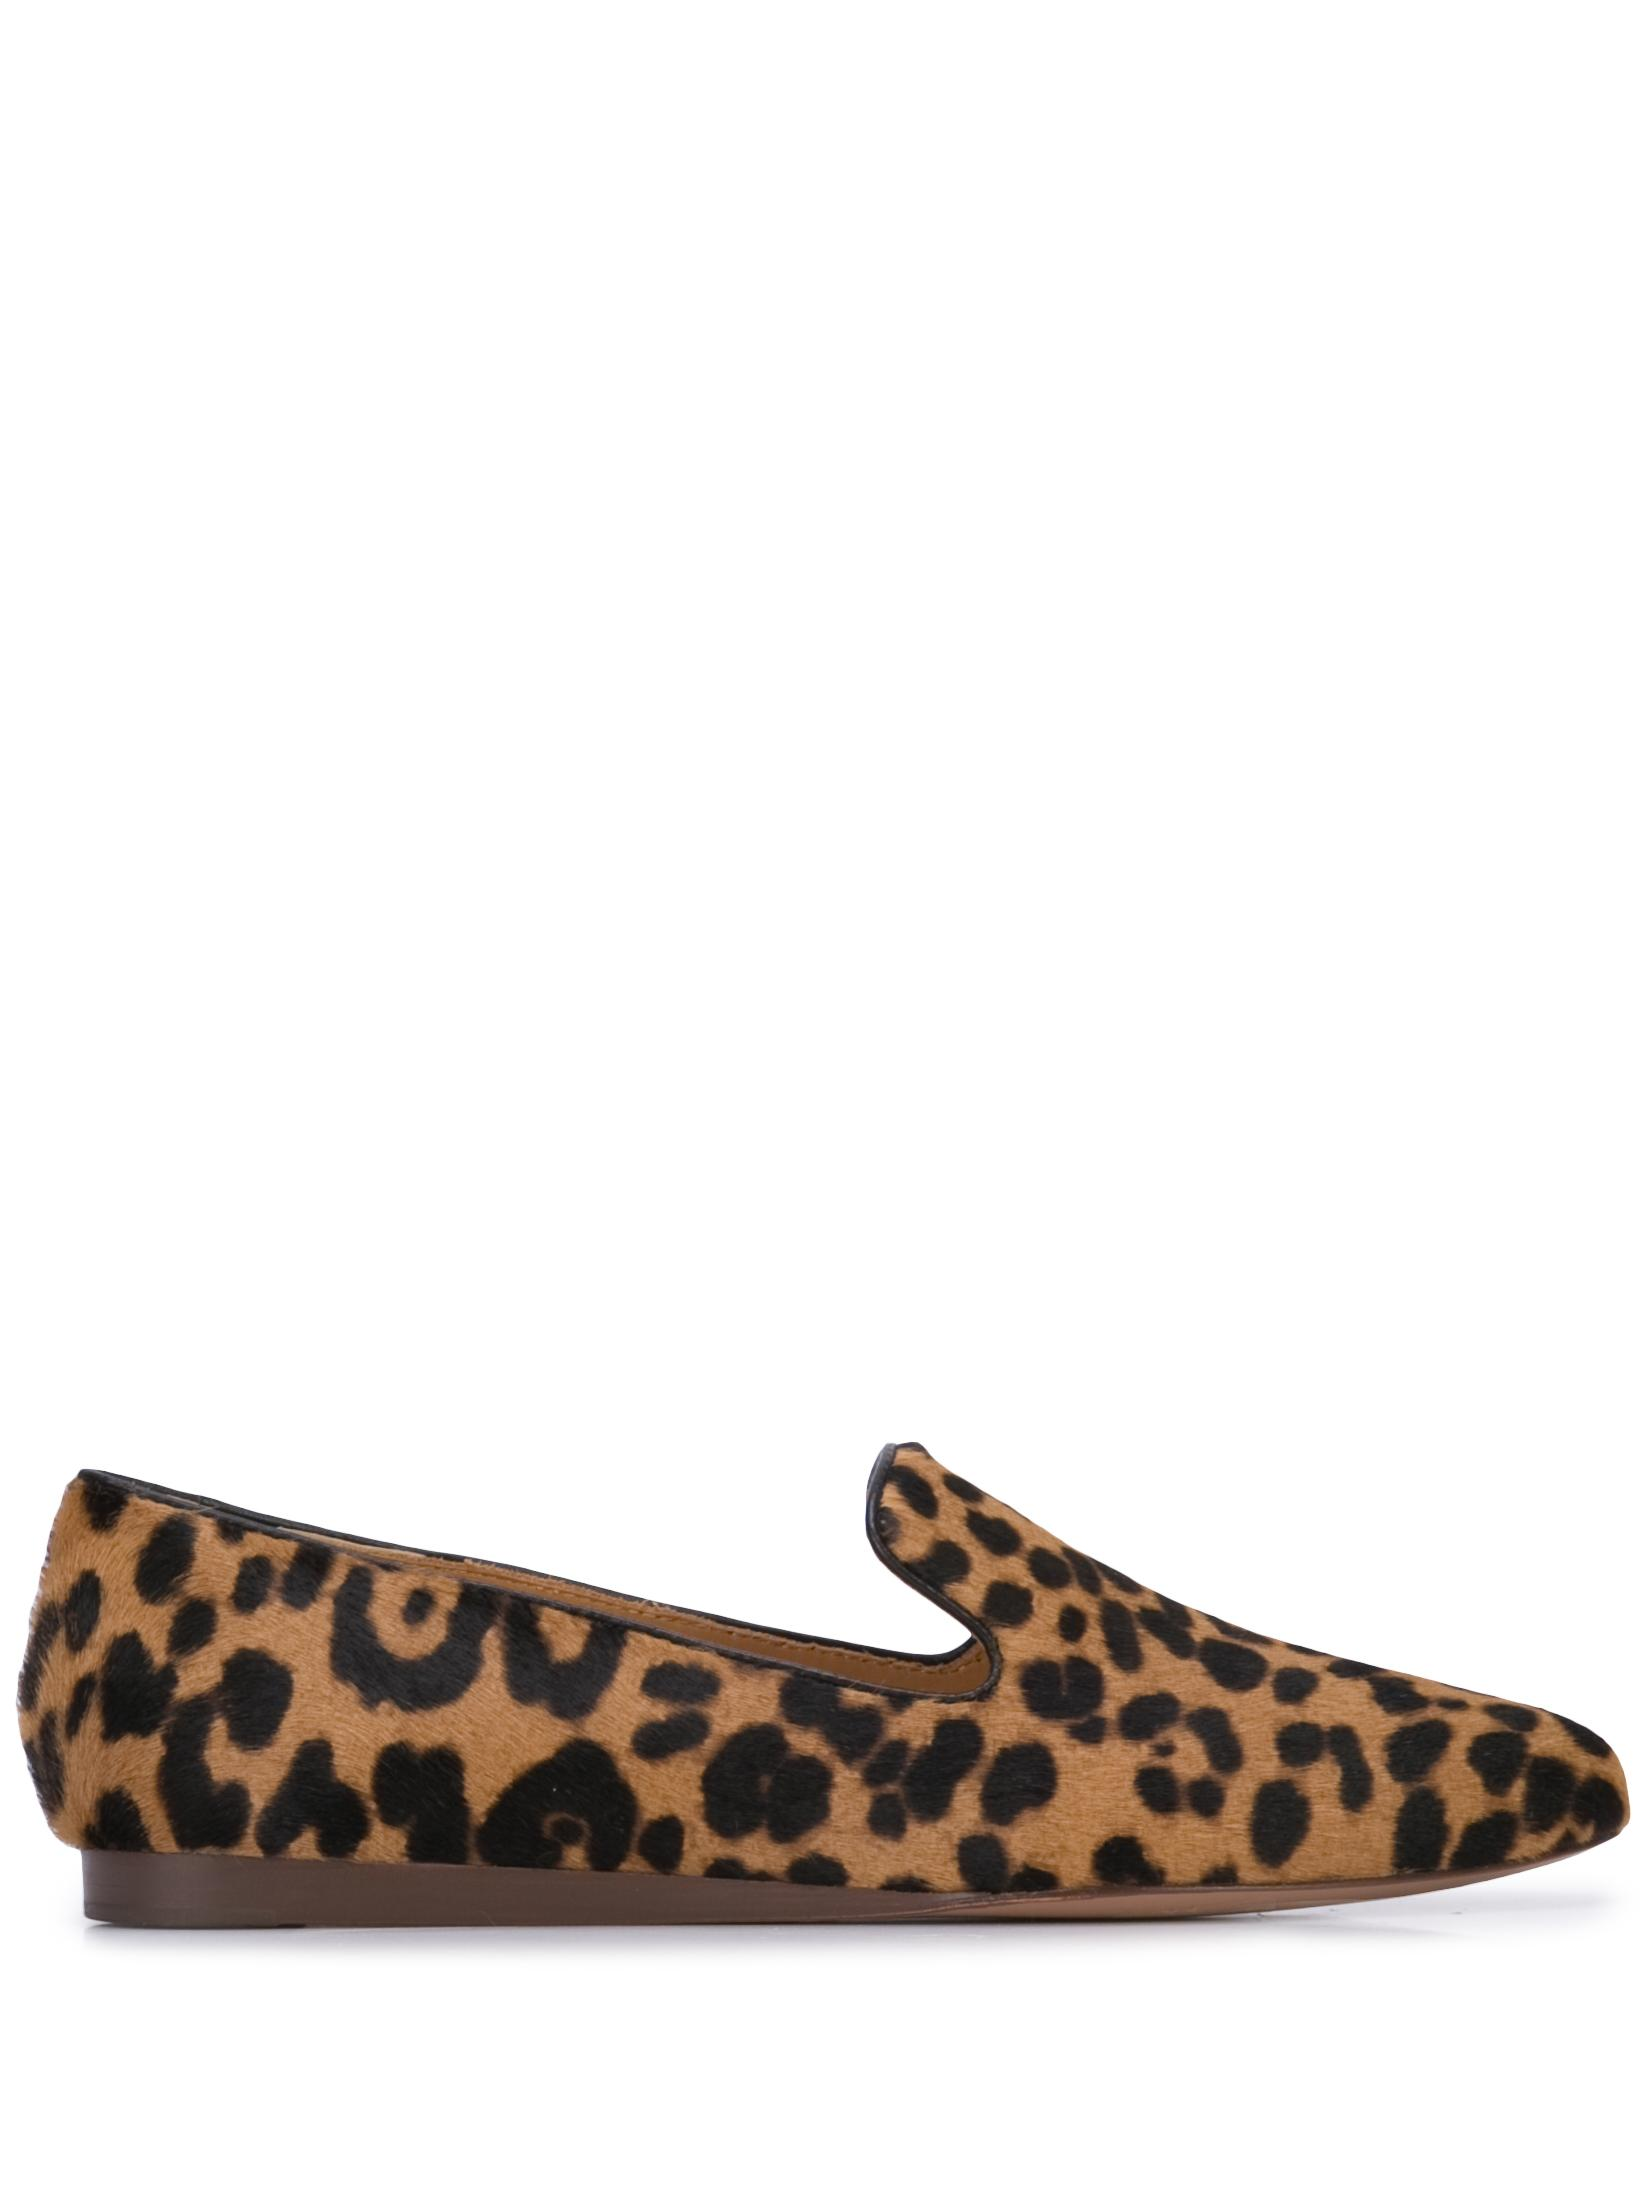 Griffin Leopard Calf Hair Flat